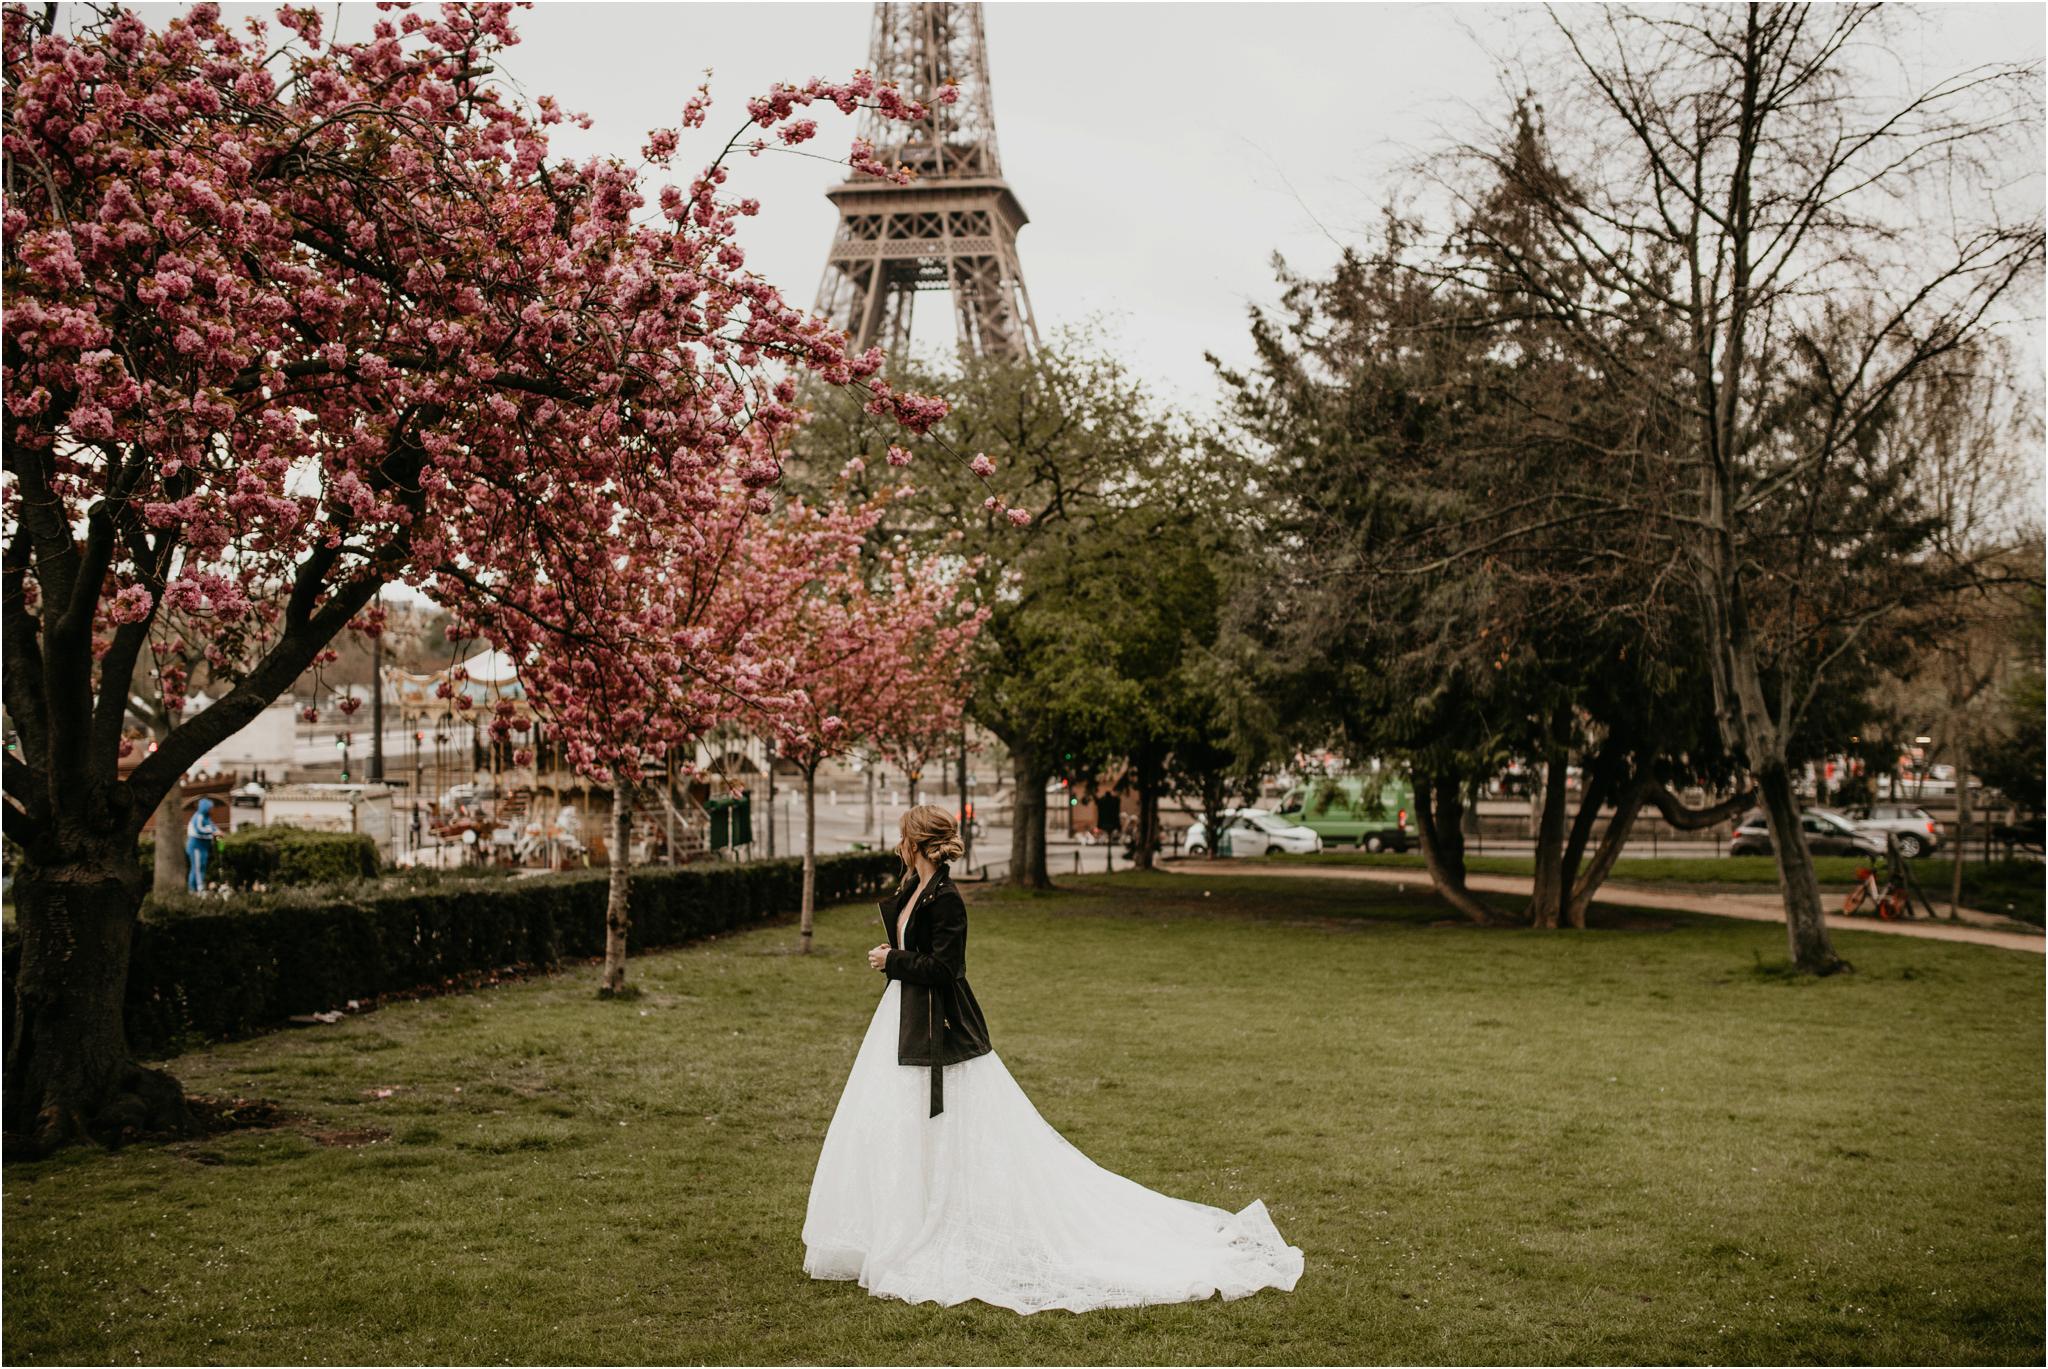 miranda-and-jared-paris-elopement-destination-wedding-photographer-027.jpg